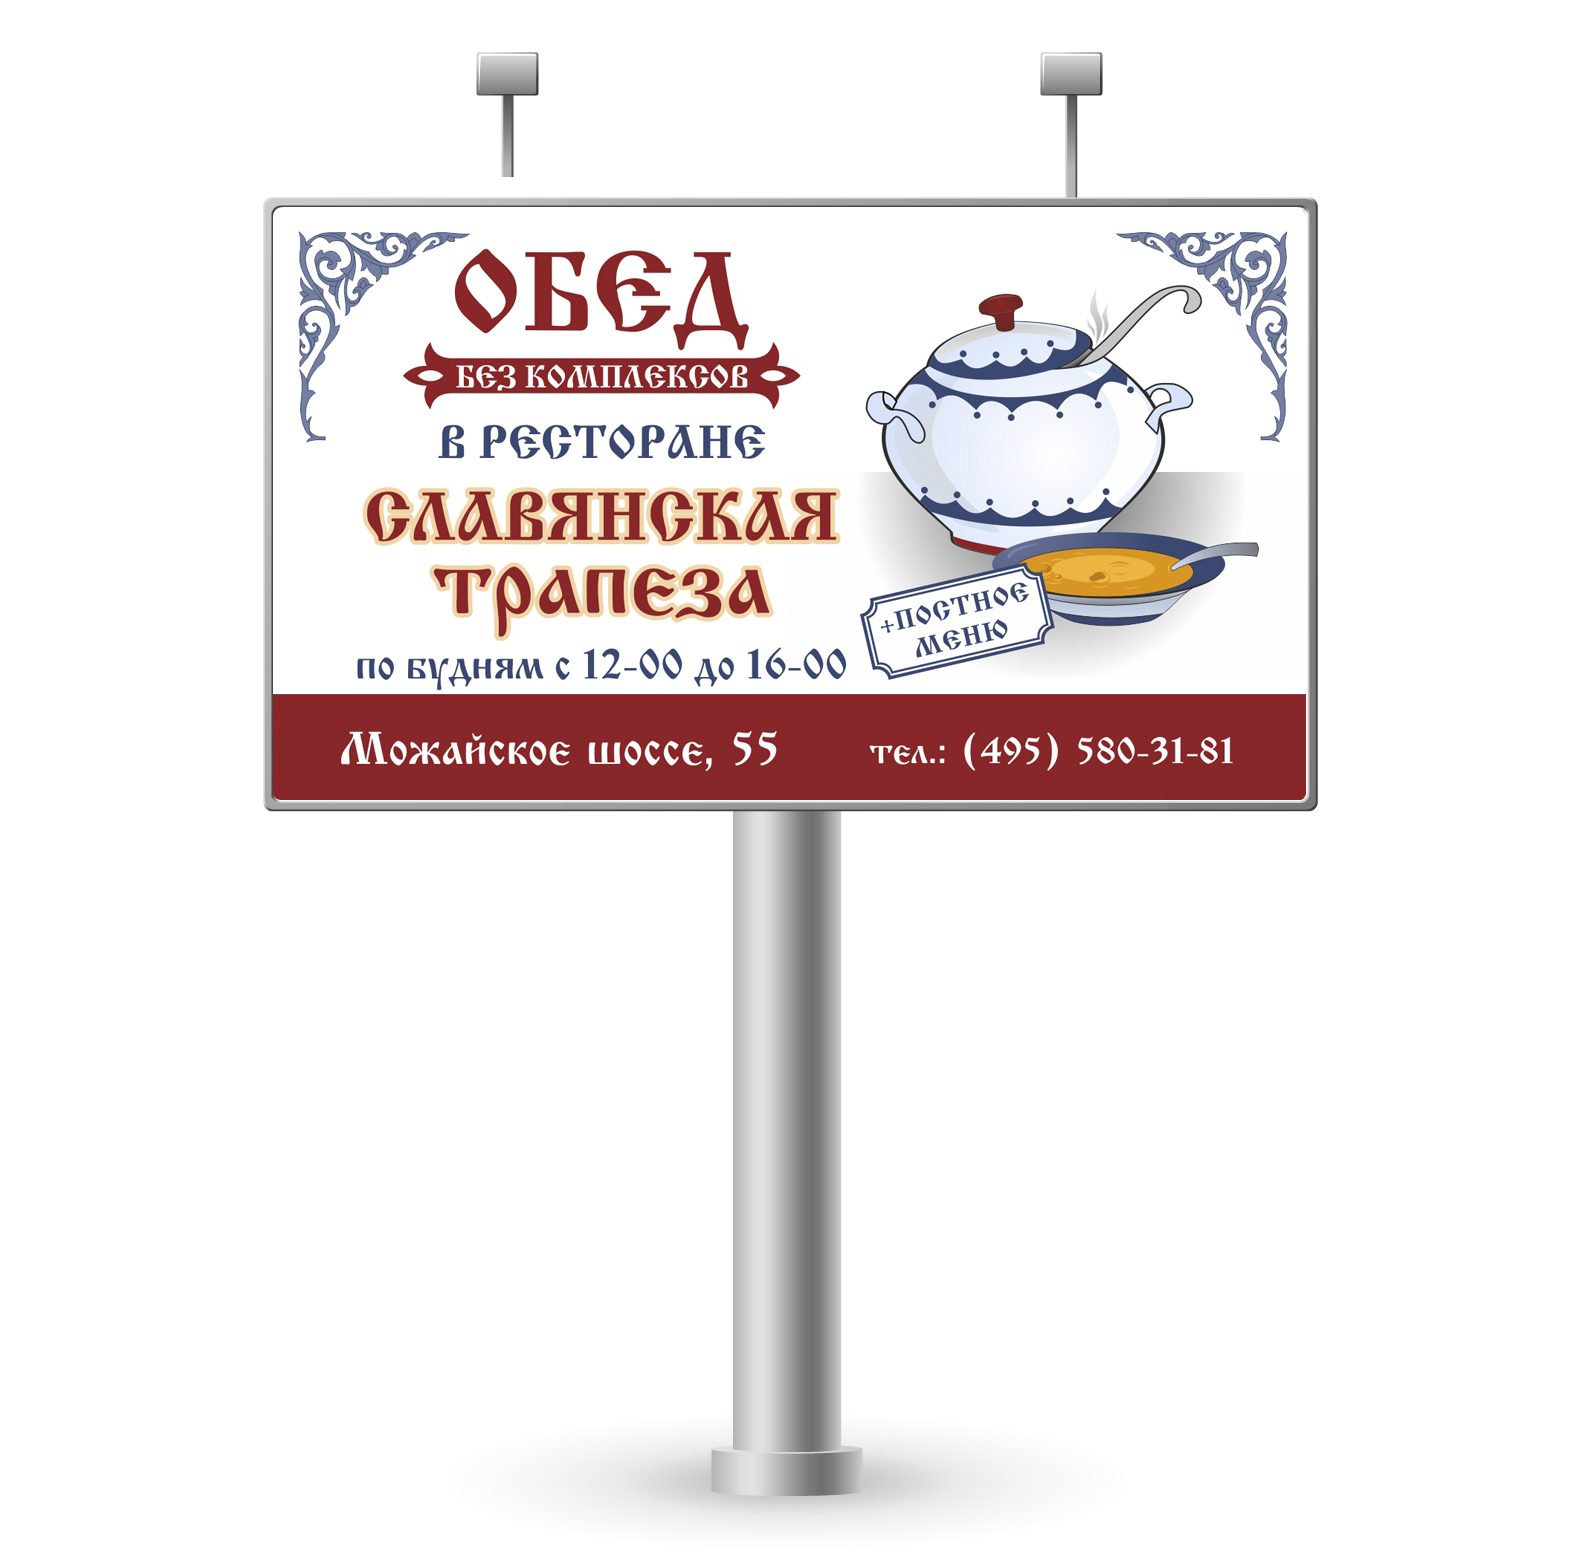 "Биллборд ""Обед без комплексов"" для ресторана ""Славянская трапеза"" (МО, г. Одинцово)"